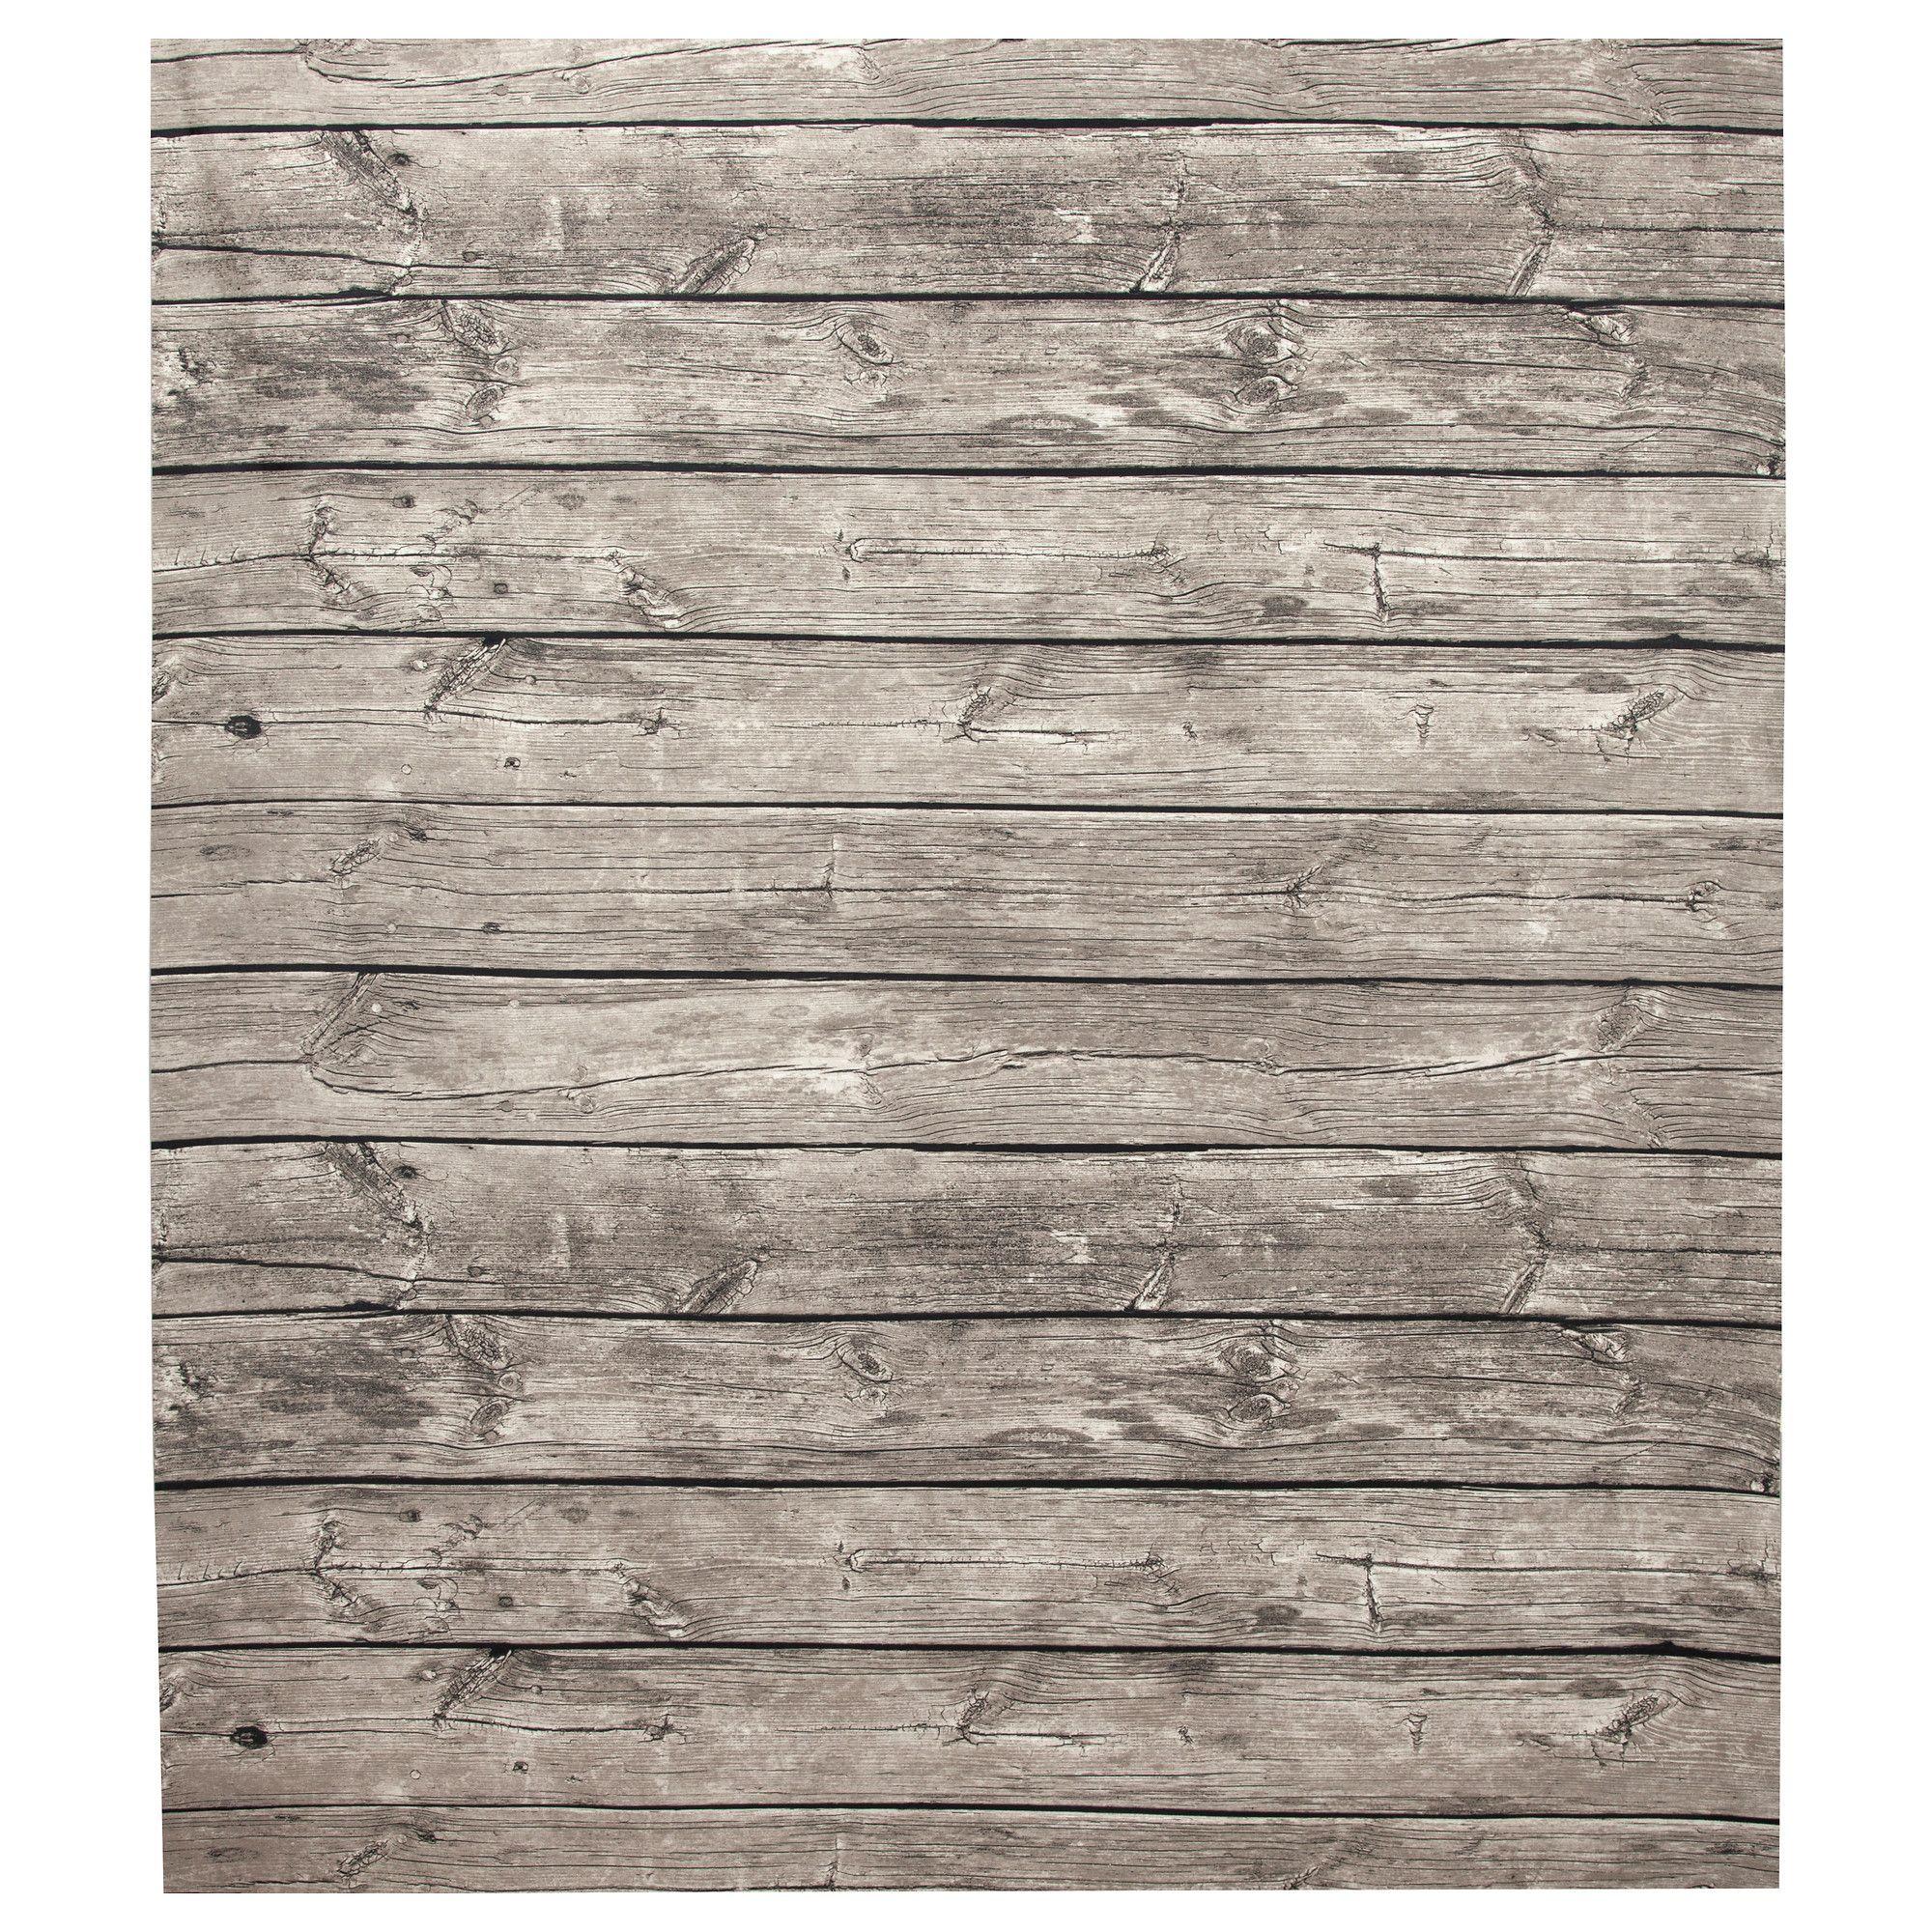 Ikea Canada LISEL Plastic-coated Fabric, Wood Effect